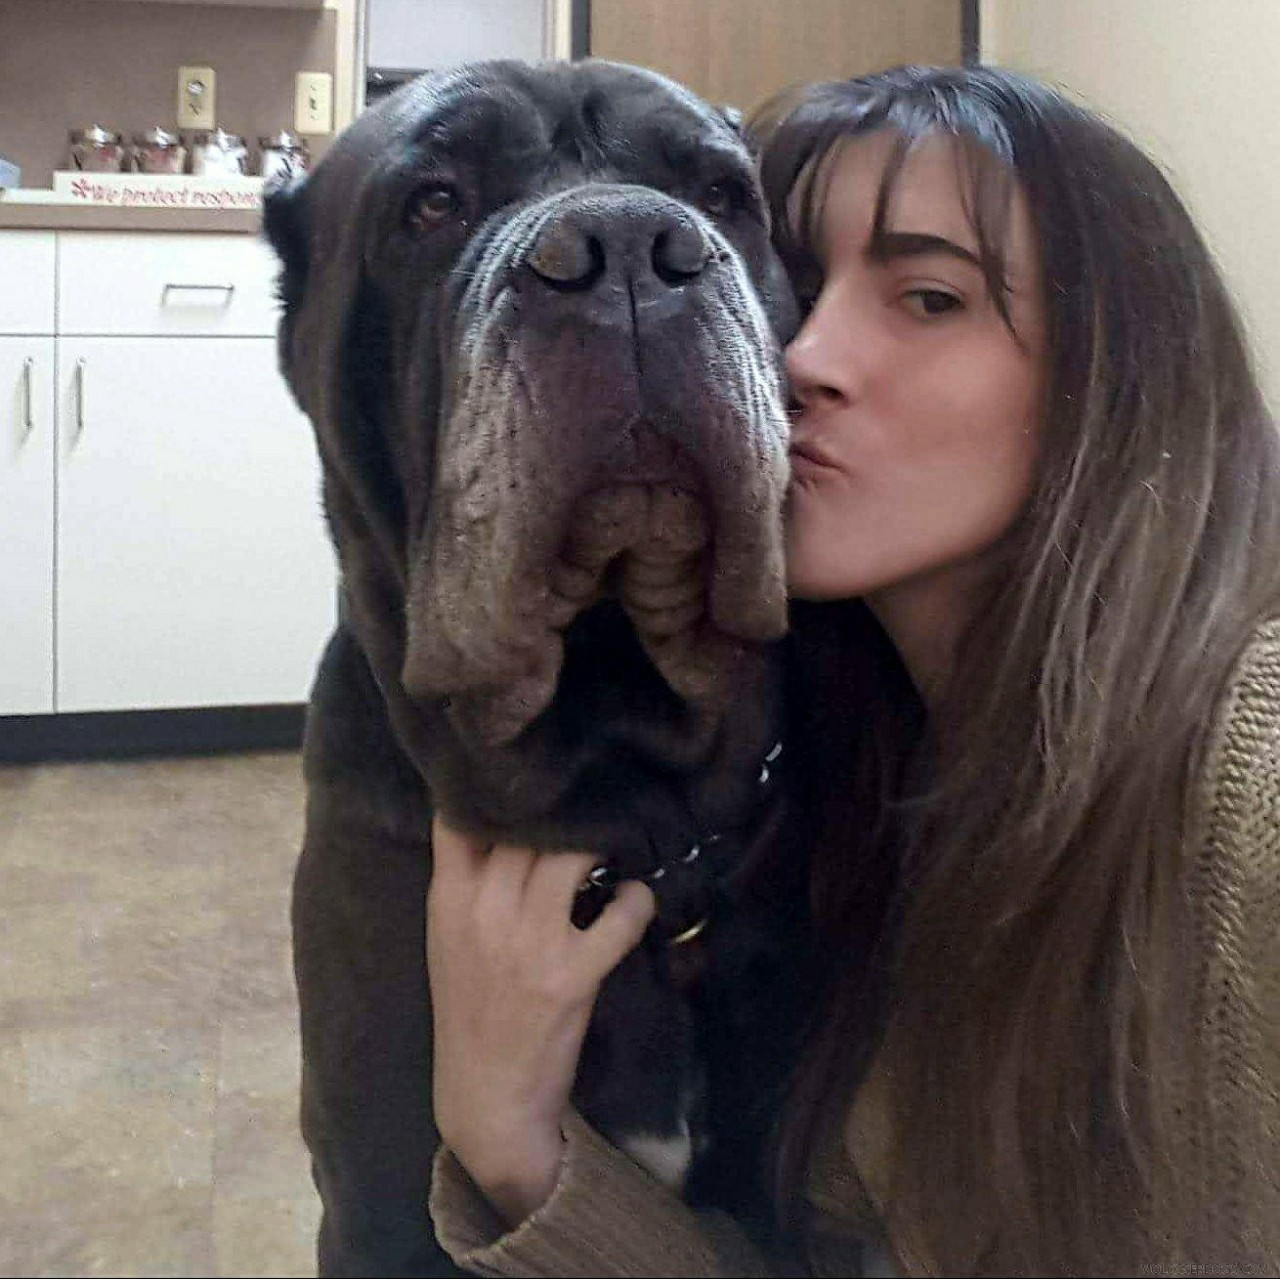 bosco kiss